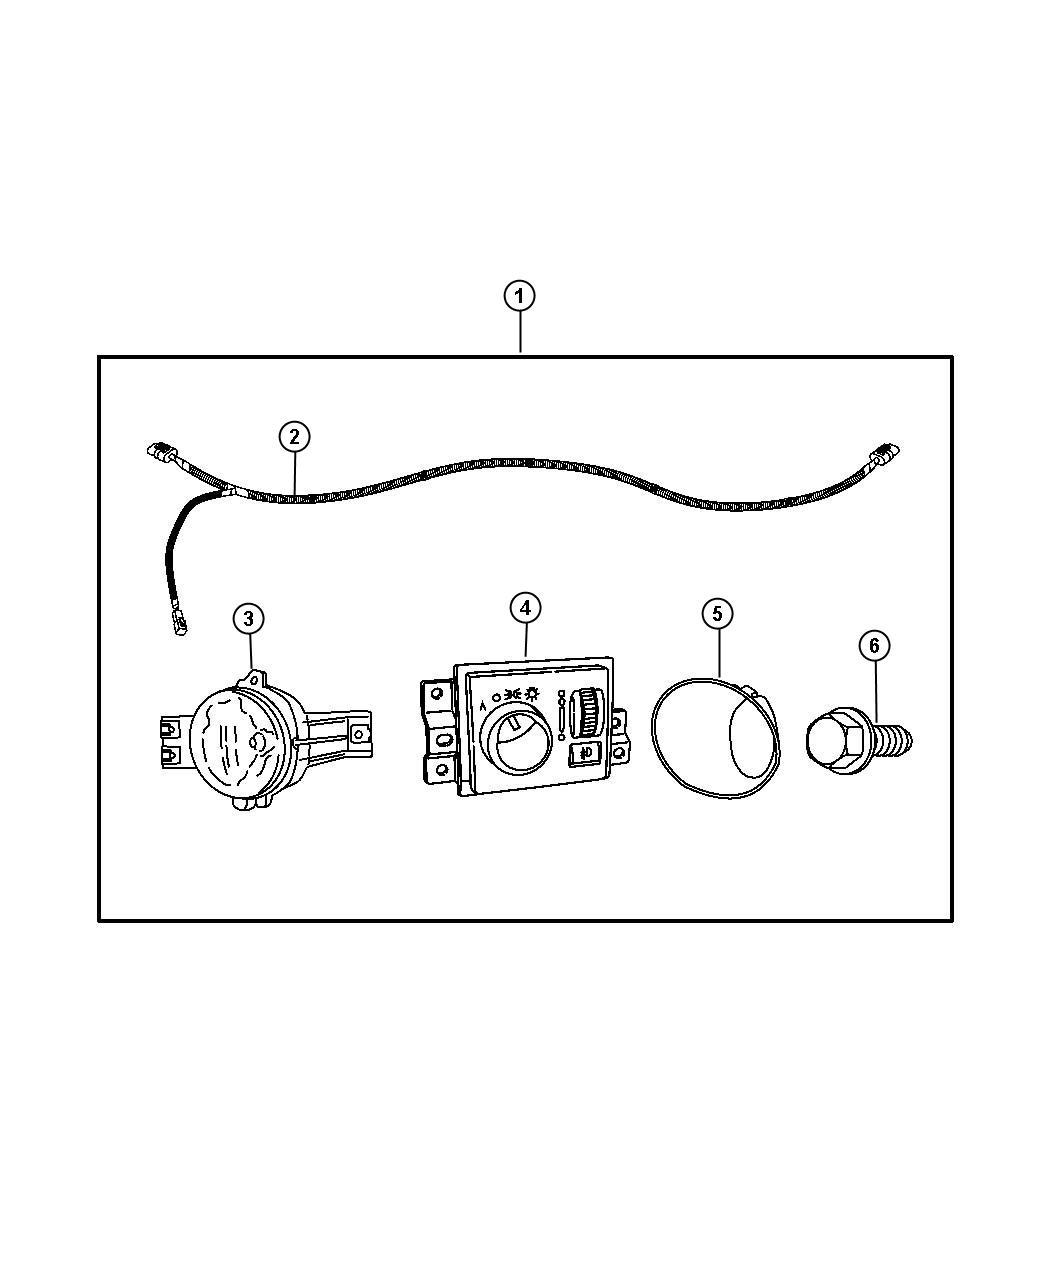 Dodge Ram 5500 Fog Lights, Complete Kit, includes switch